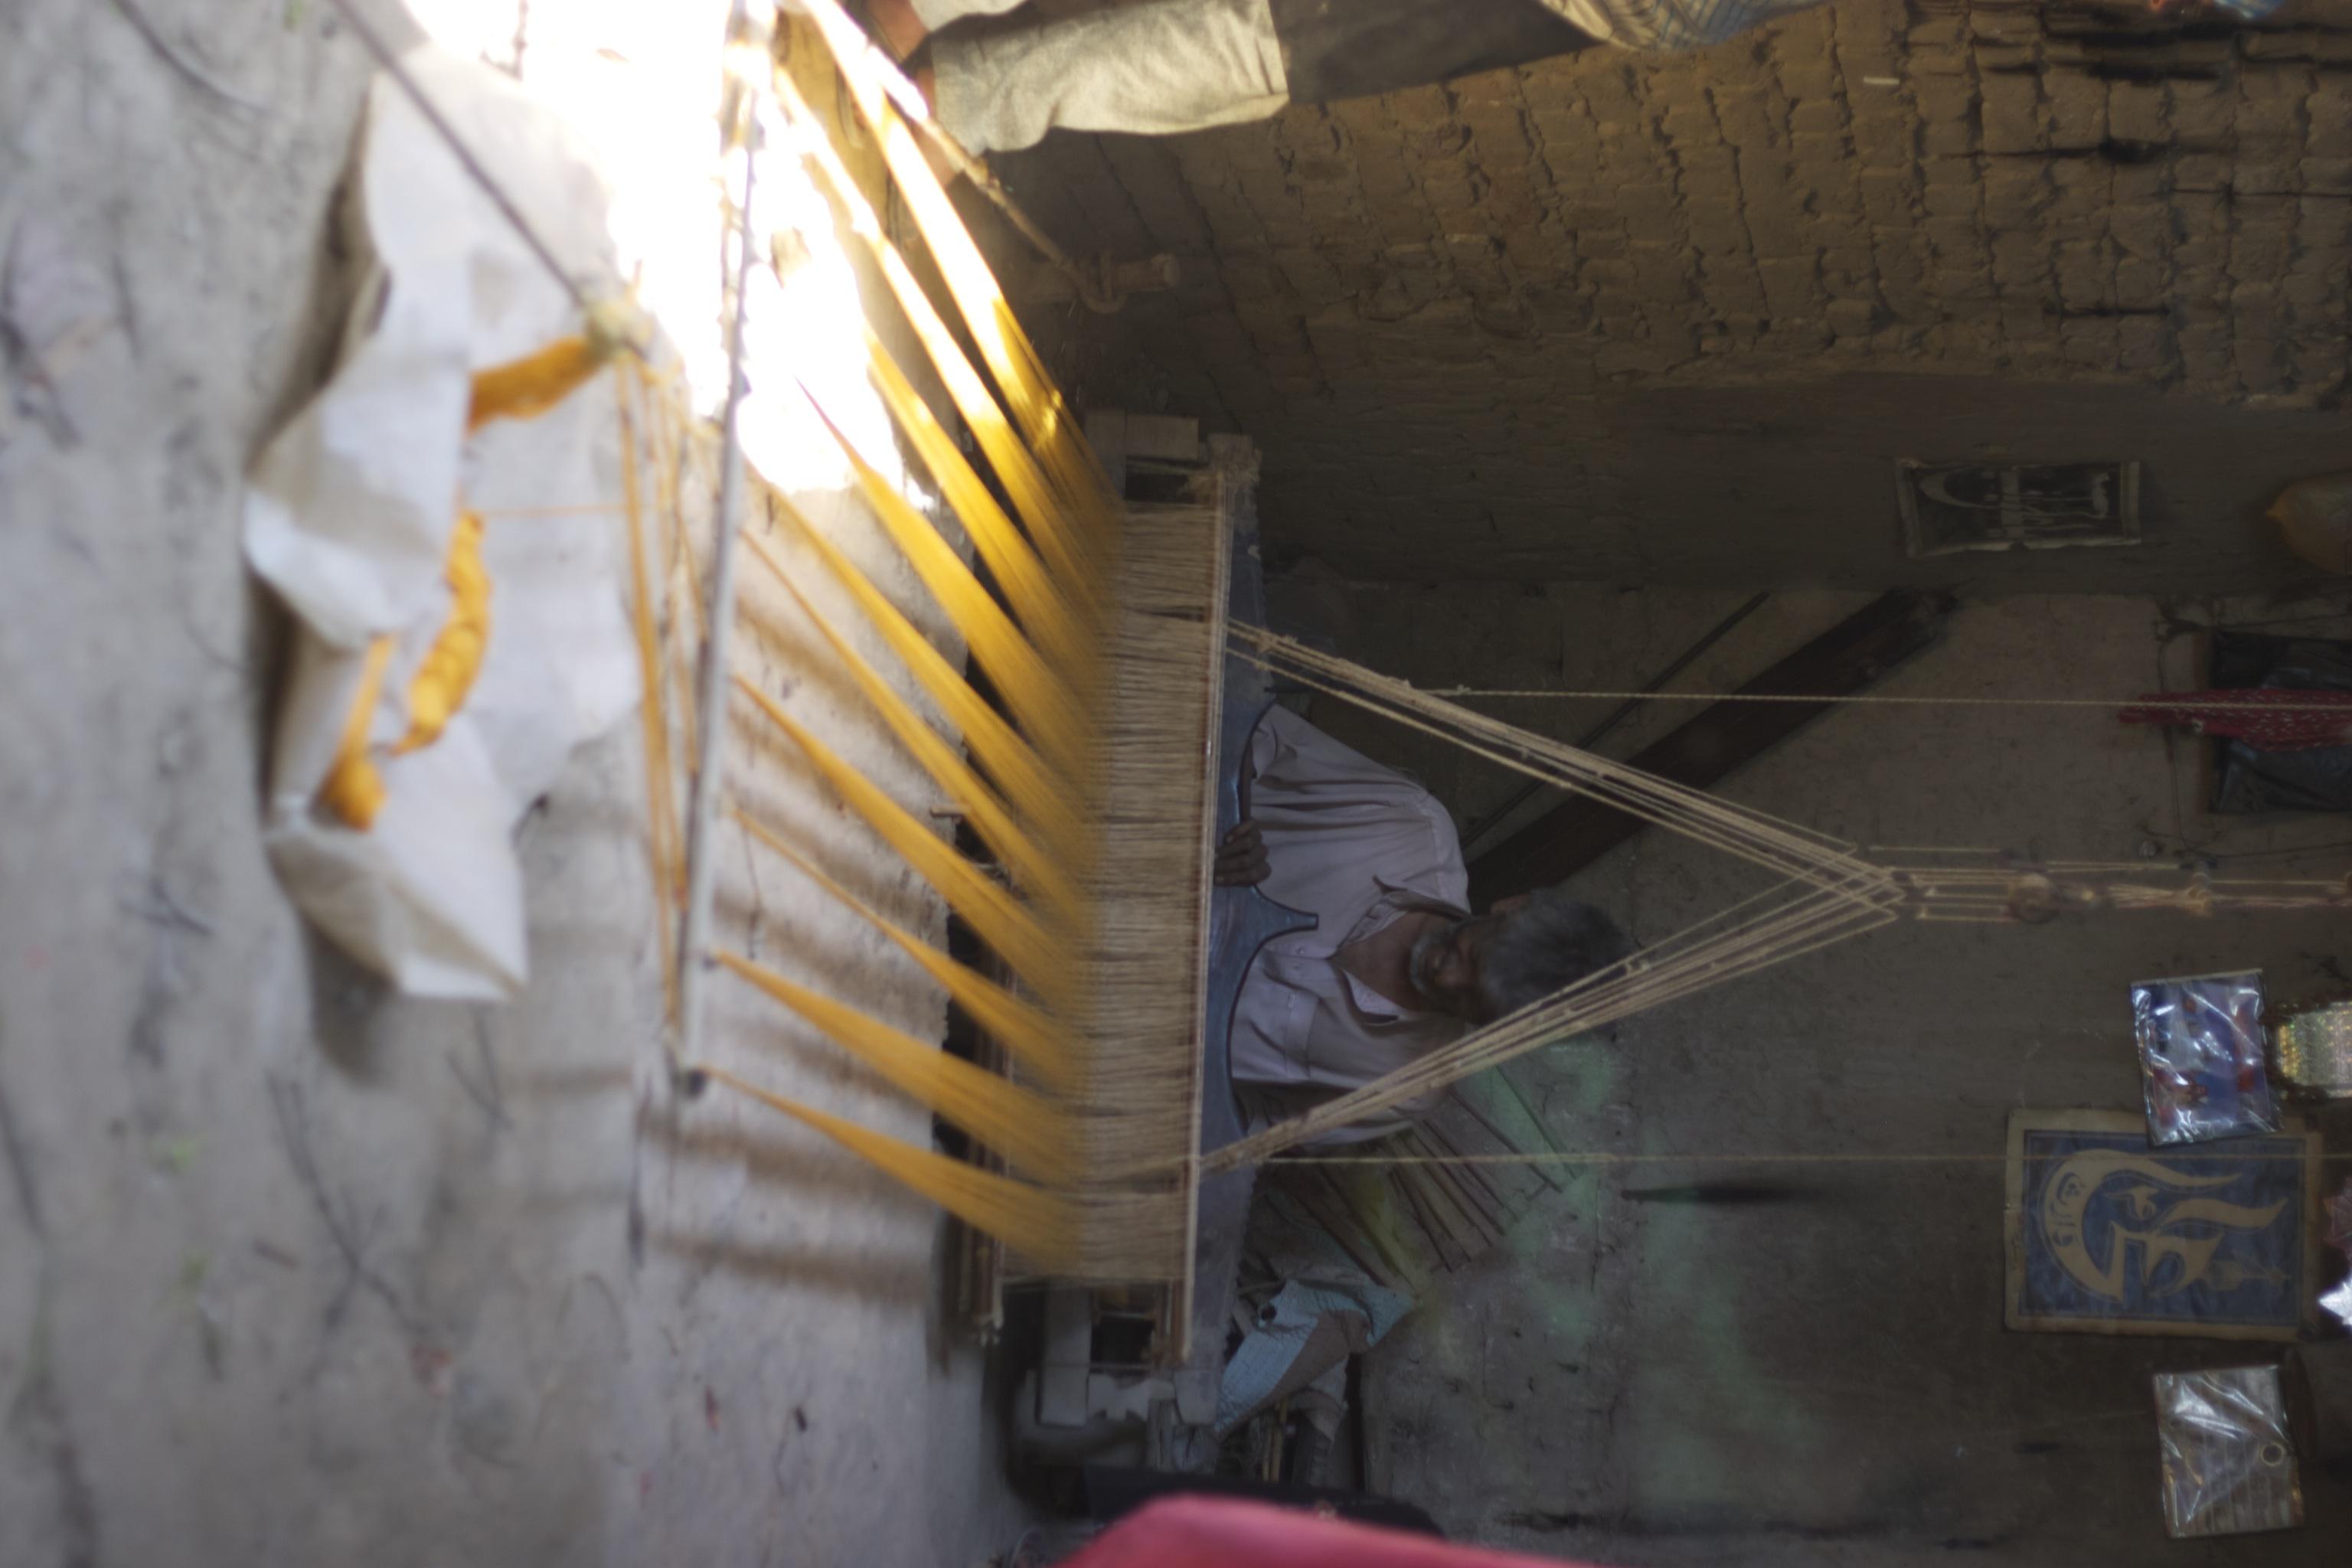 Lal Buksh at his loom